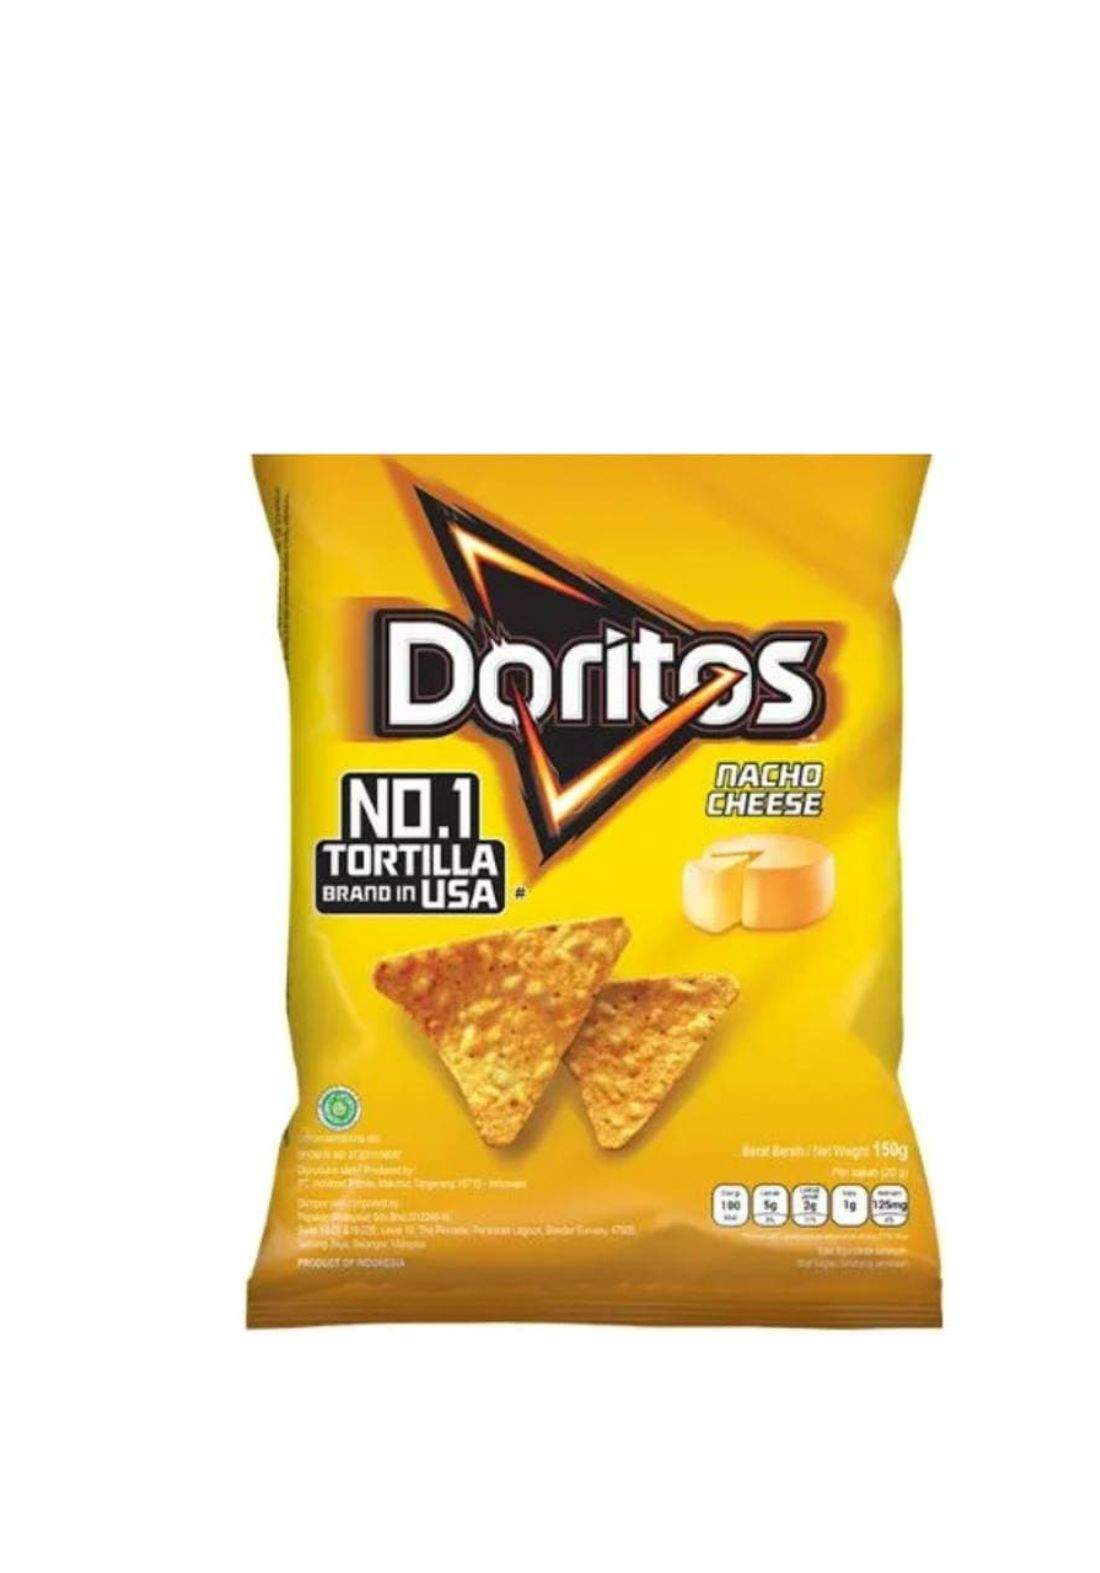 Doritos Chips150g دوريتوس شبس